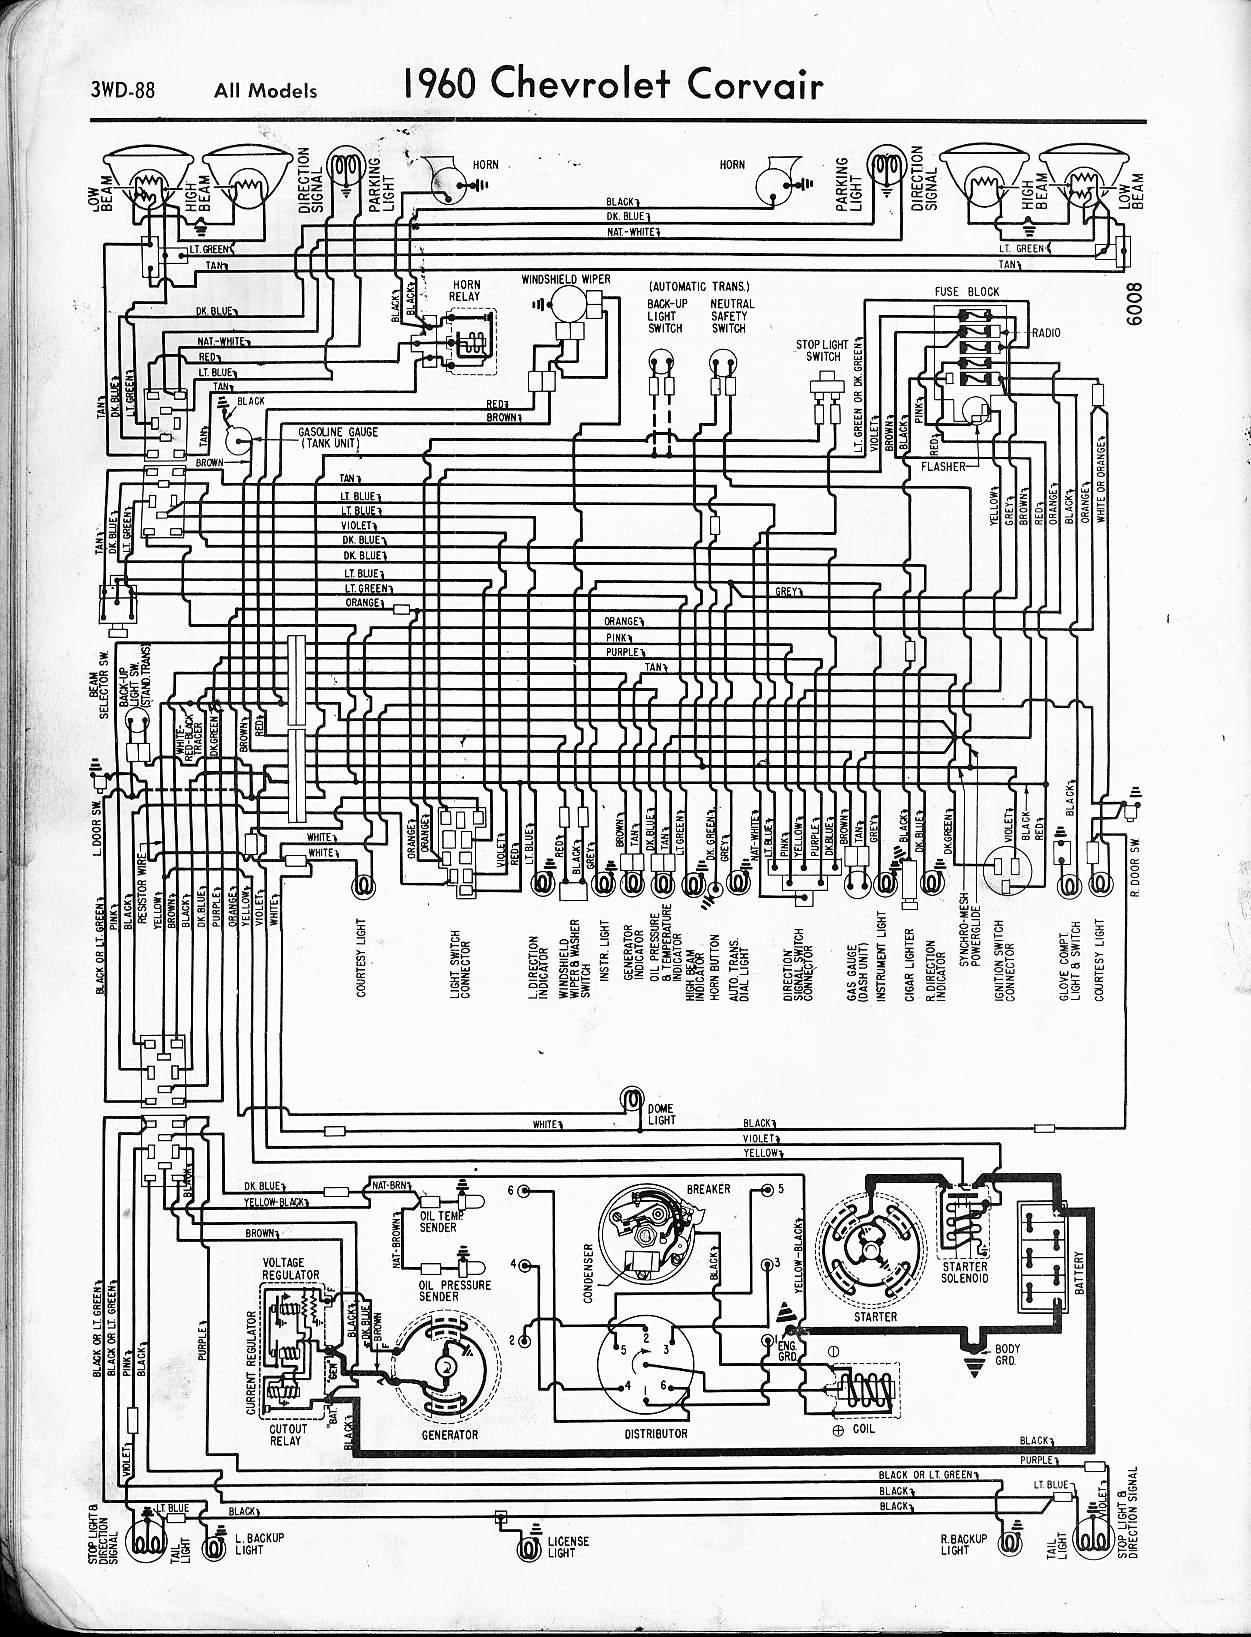 1951 Chevy Car Wiring Diagram Chevrolet